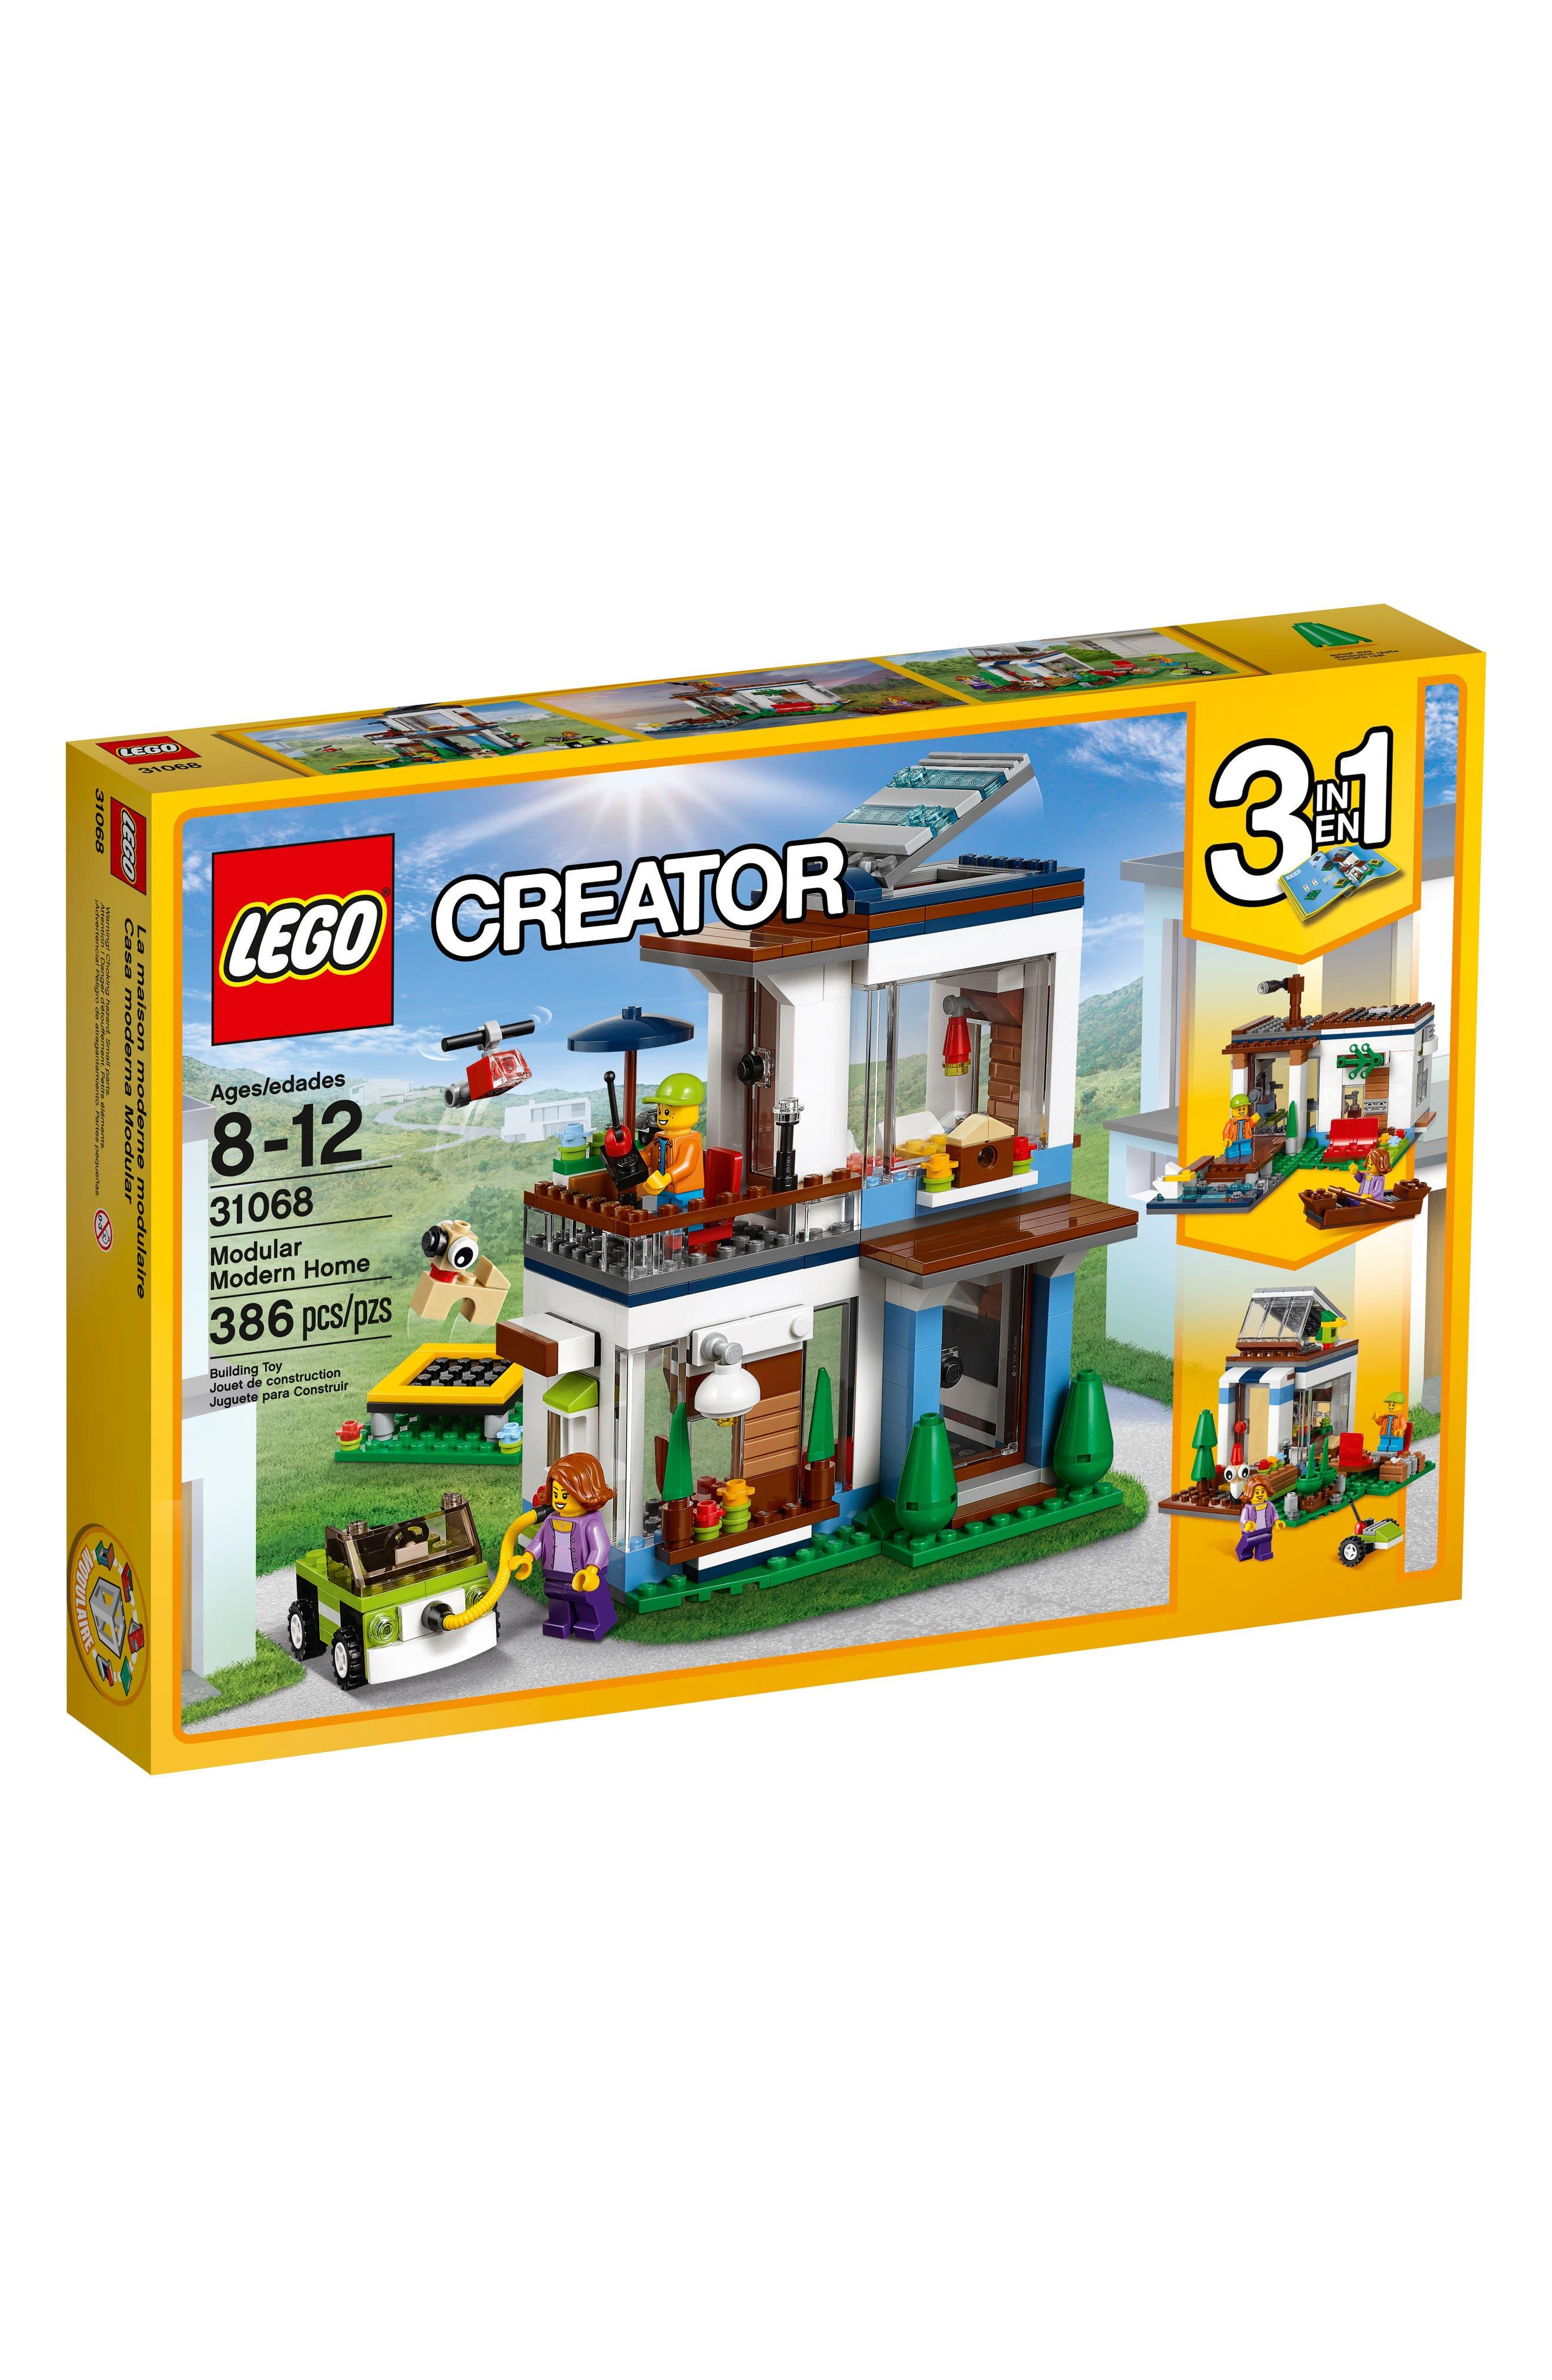 Creator 3-in-1 Modular Modern Home Play Set - 31068,                             Main thumbnail 1, color,